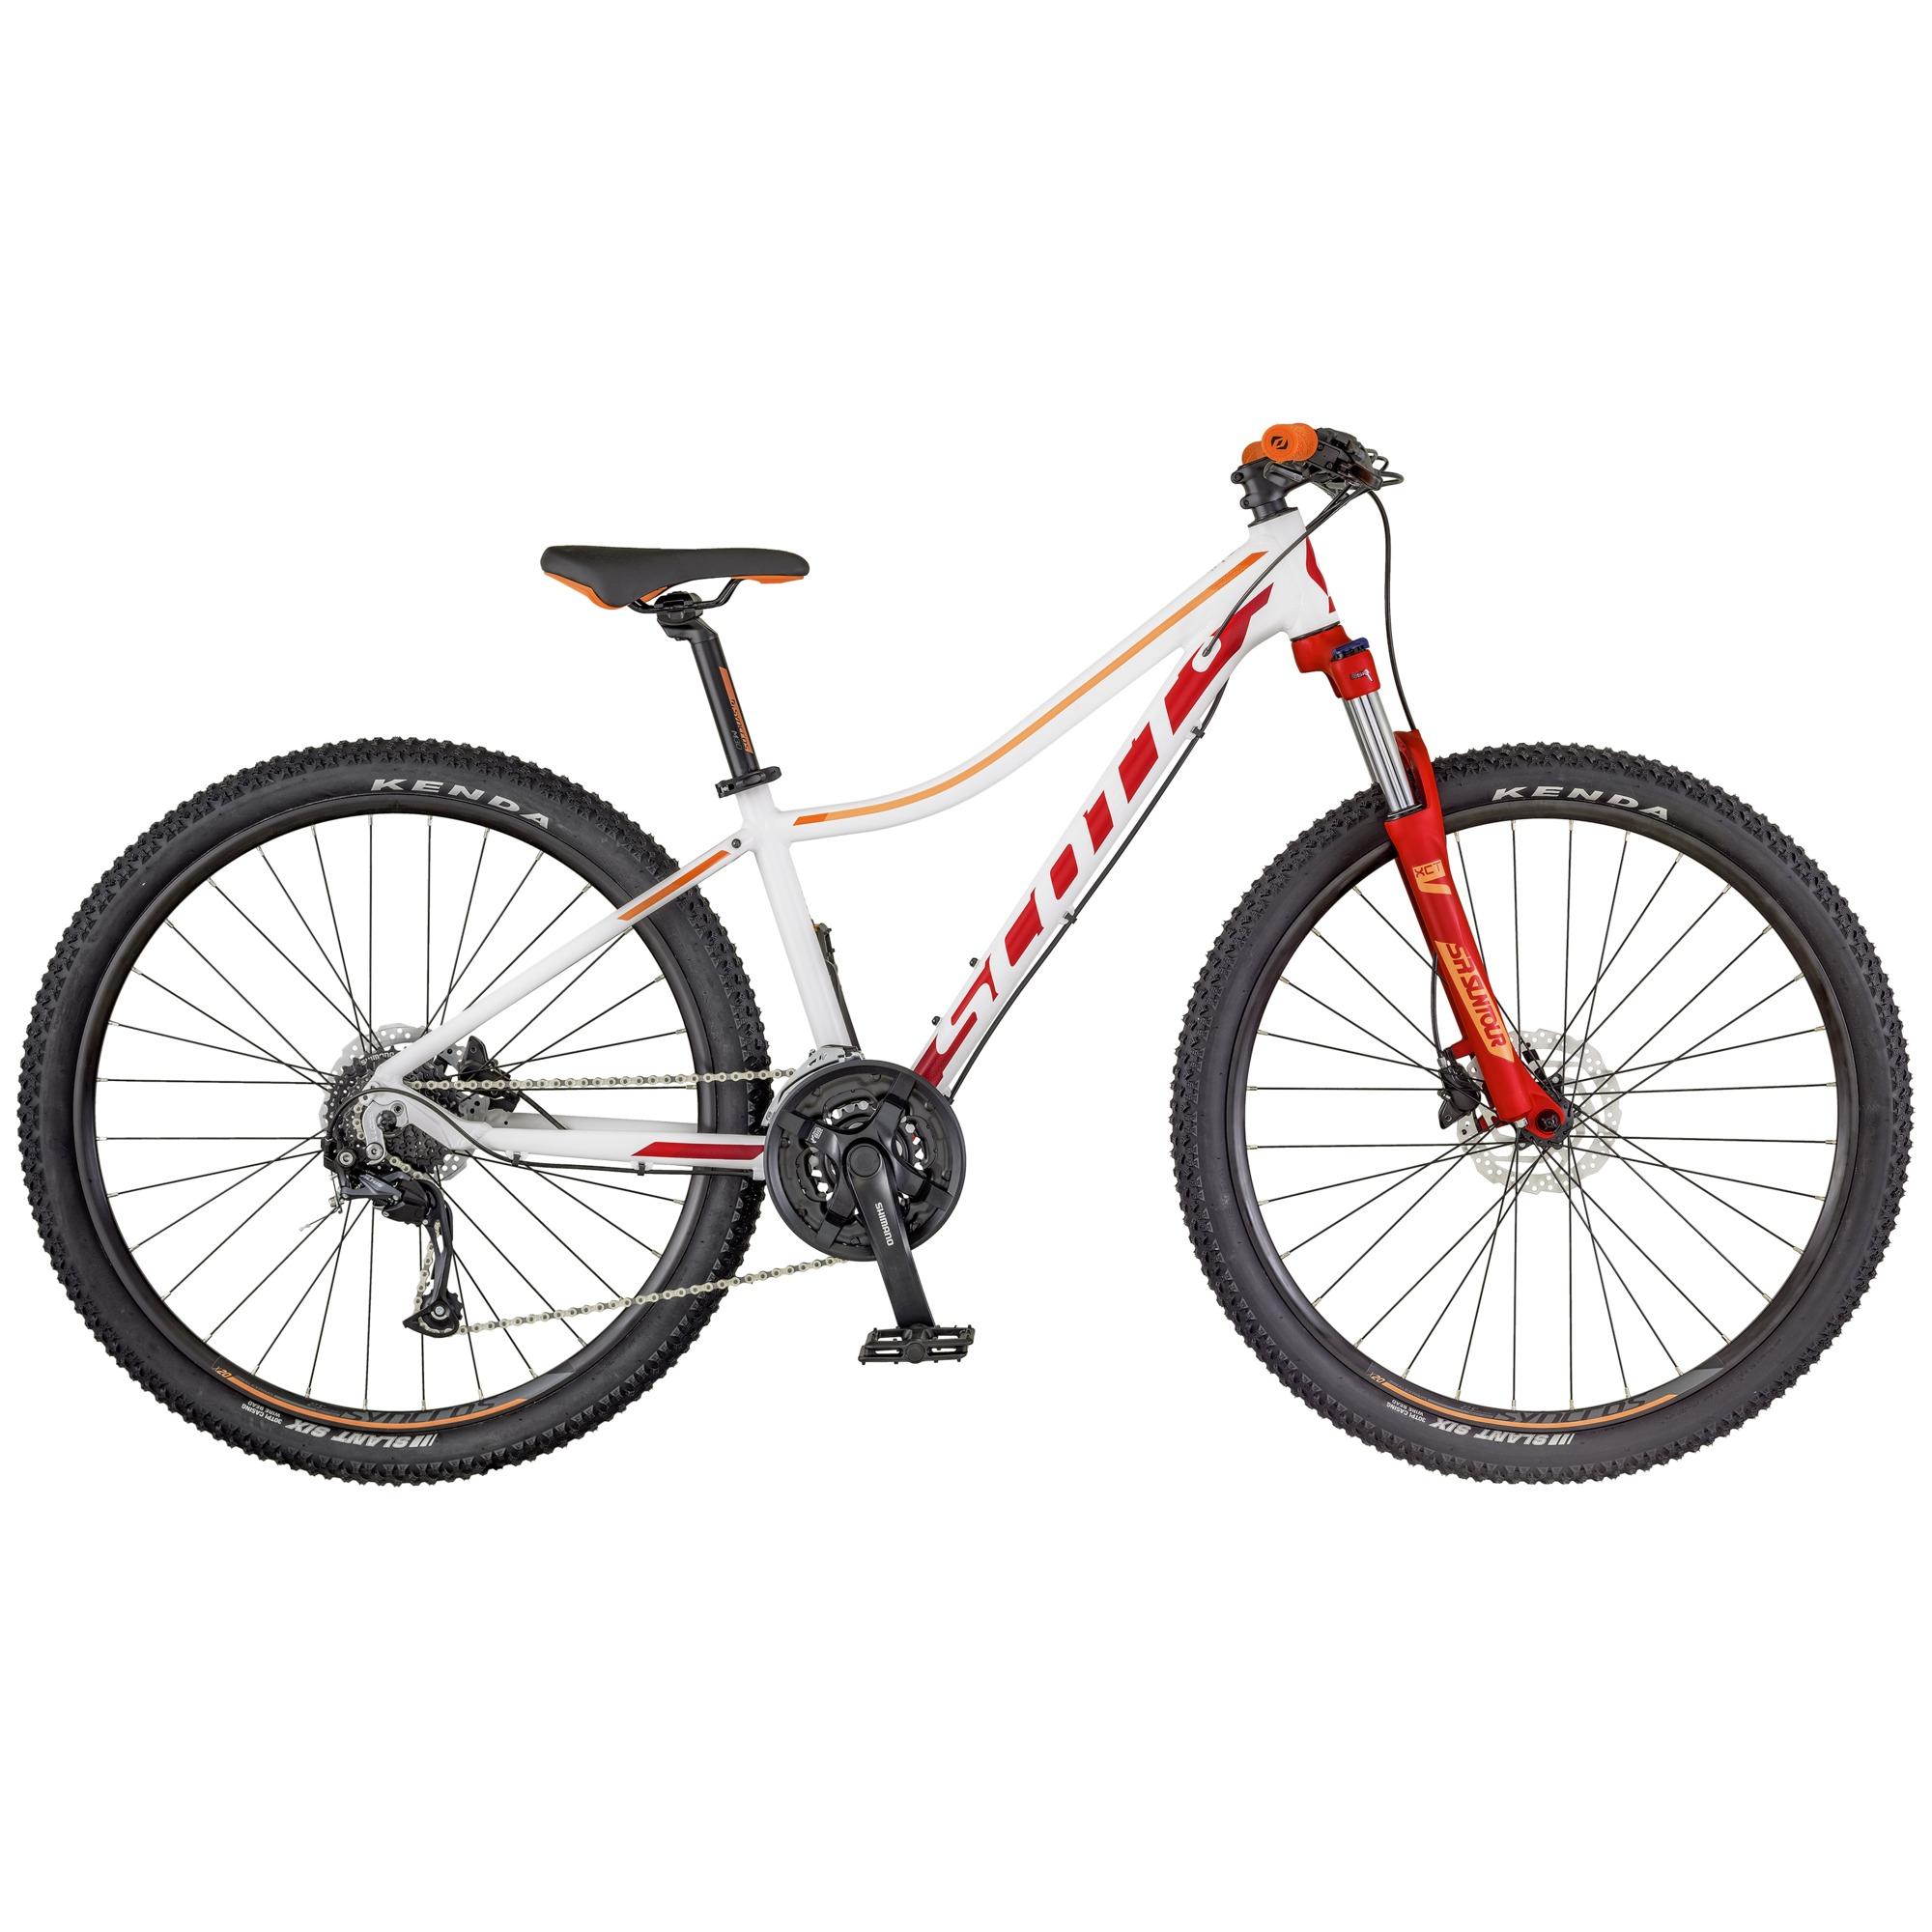 SCOTT Contessa 720 Bike white/peach S - Fahrrad online kaufen | Online Shop Bike Profis